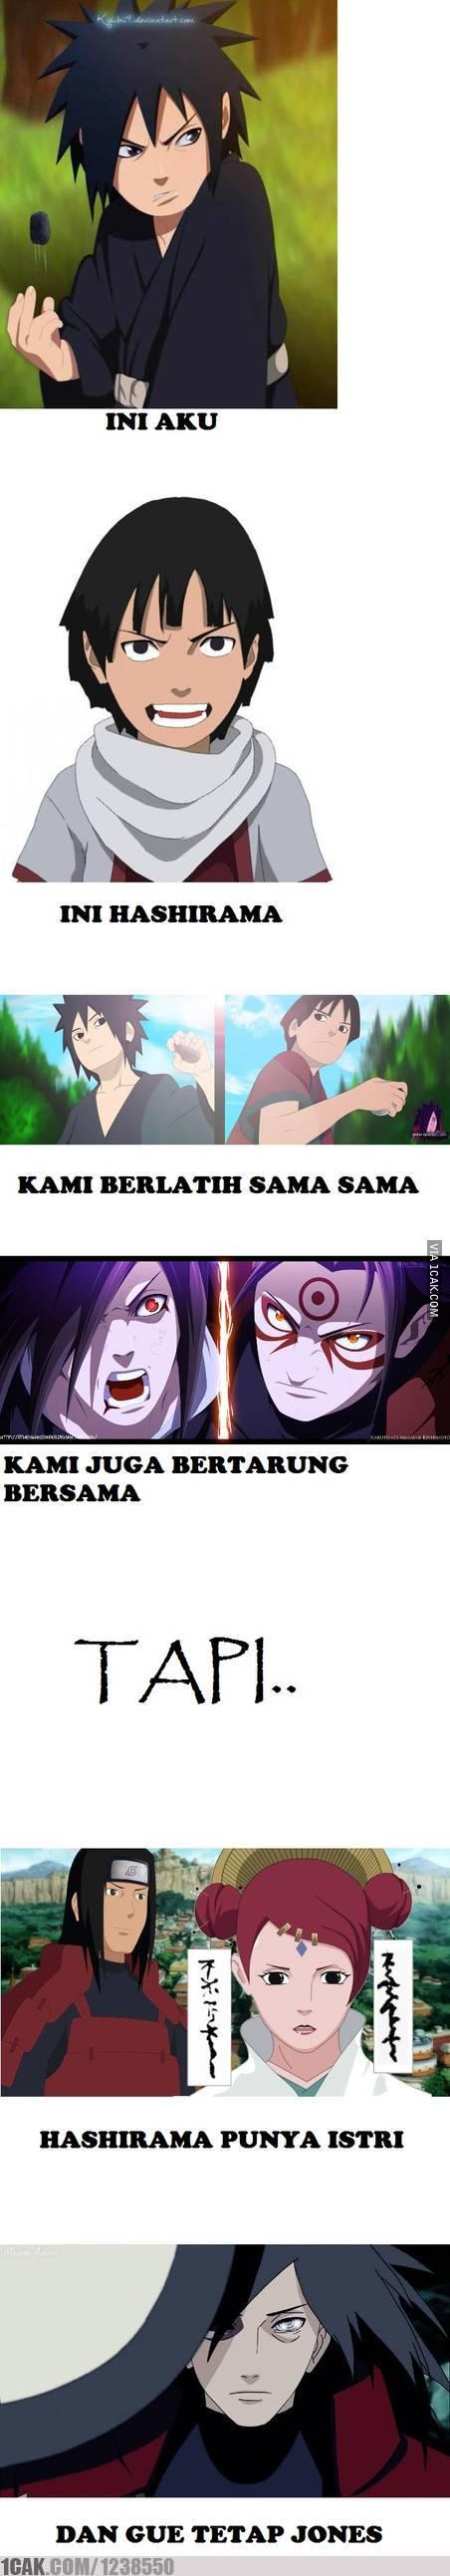 Madara Dan Hashimara Meme Indonesia Lucu V V Pinterest